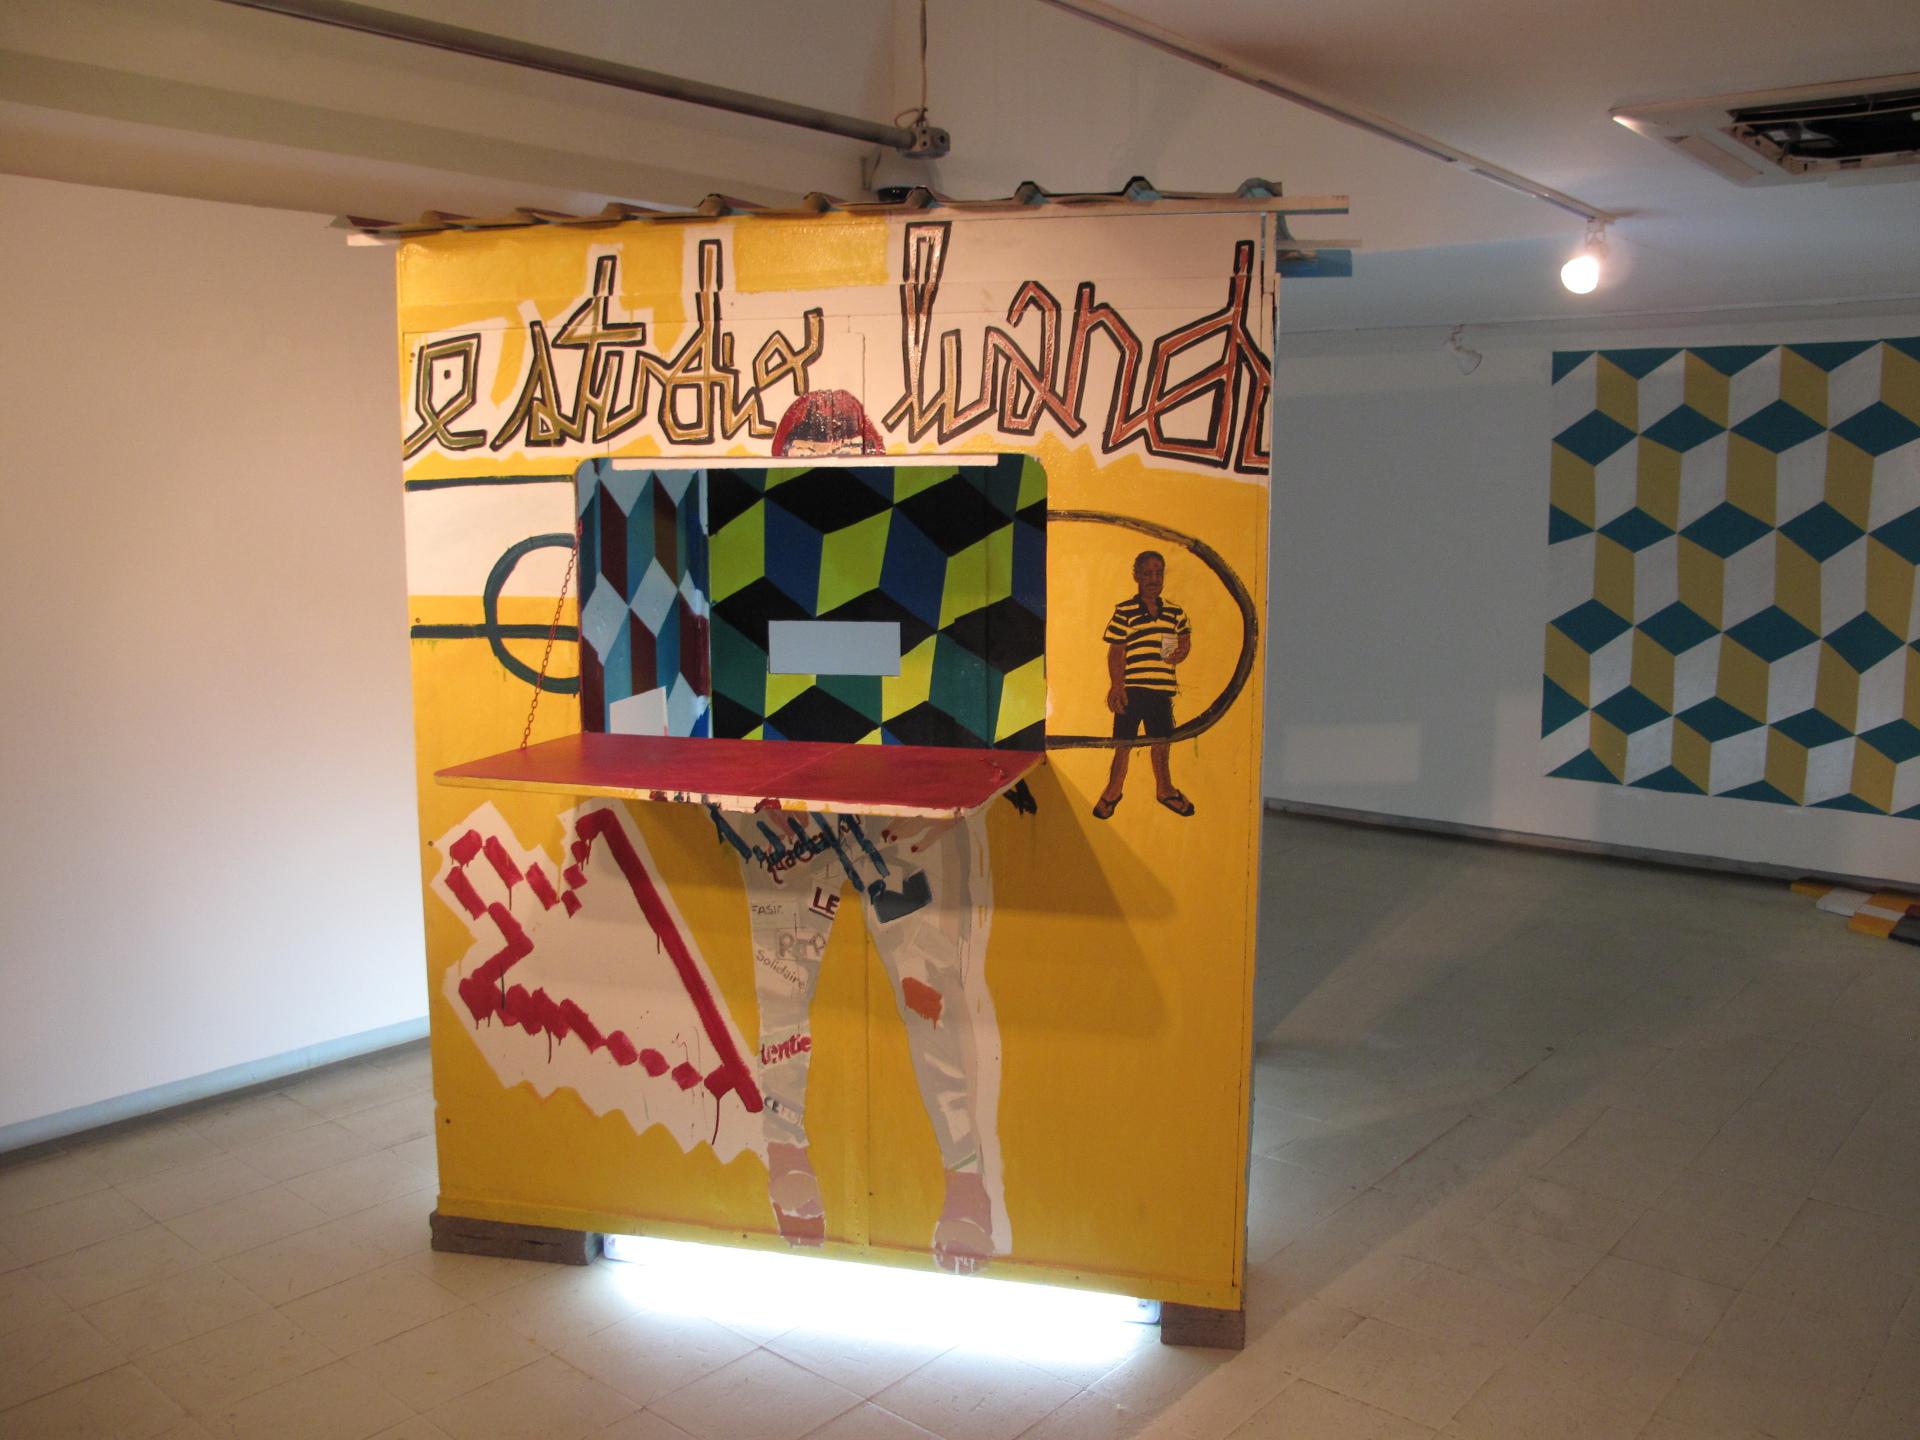 e.studio Luanda dos langa